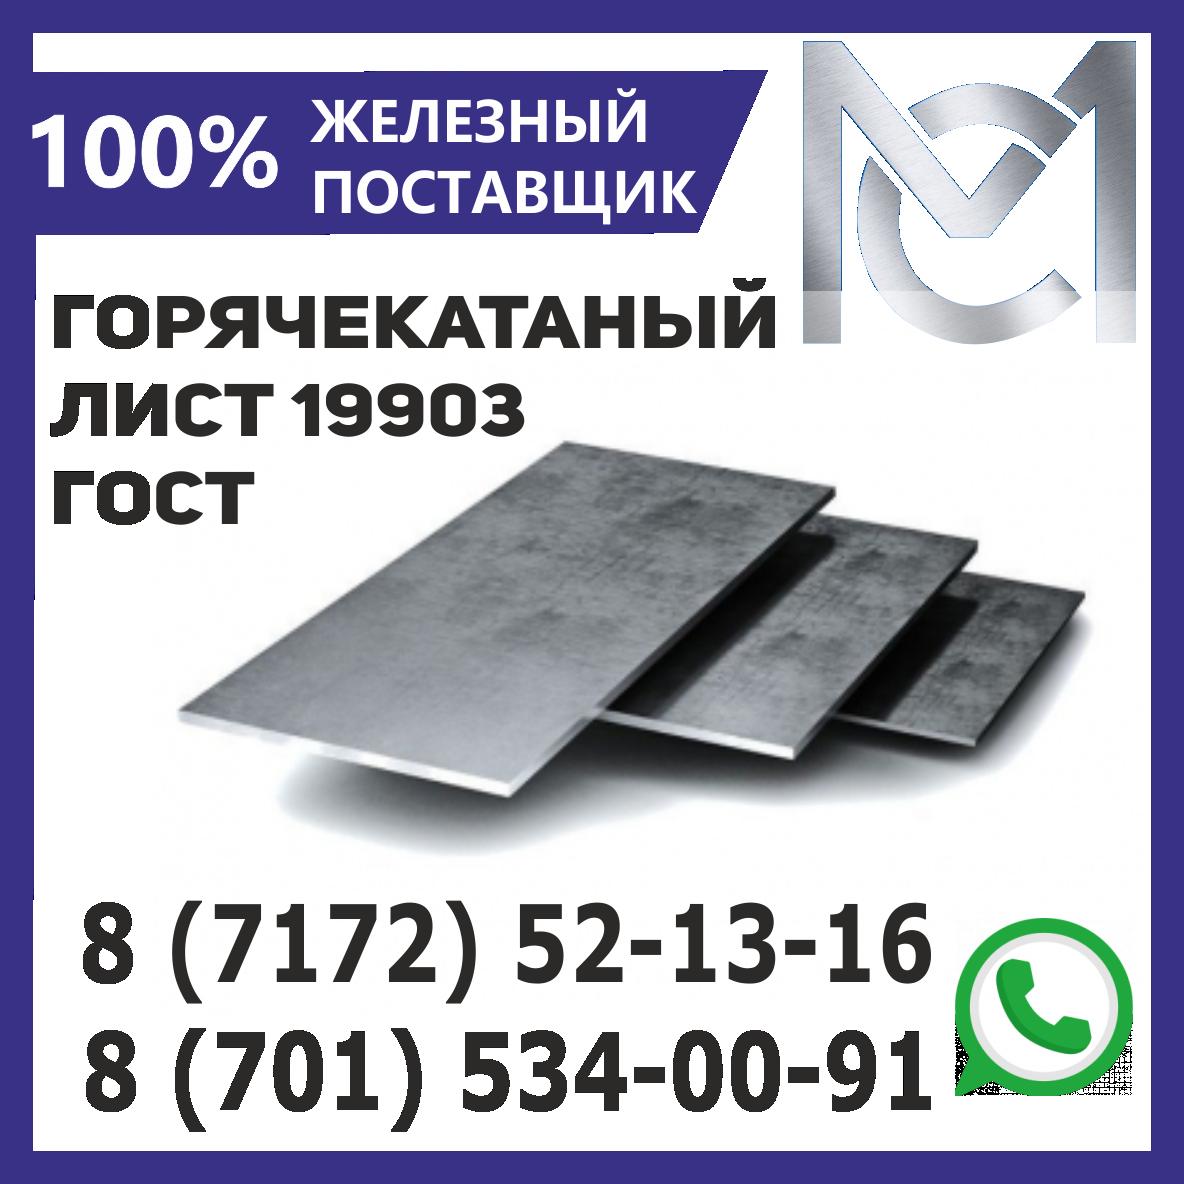 Лист 16 горячекатаный ГОСТ 19903-74, 1,5х6,0 м.